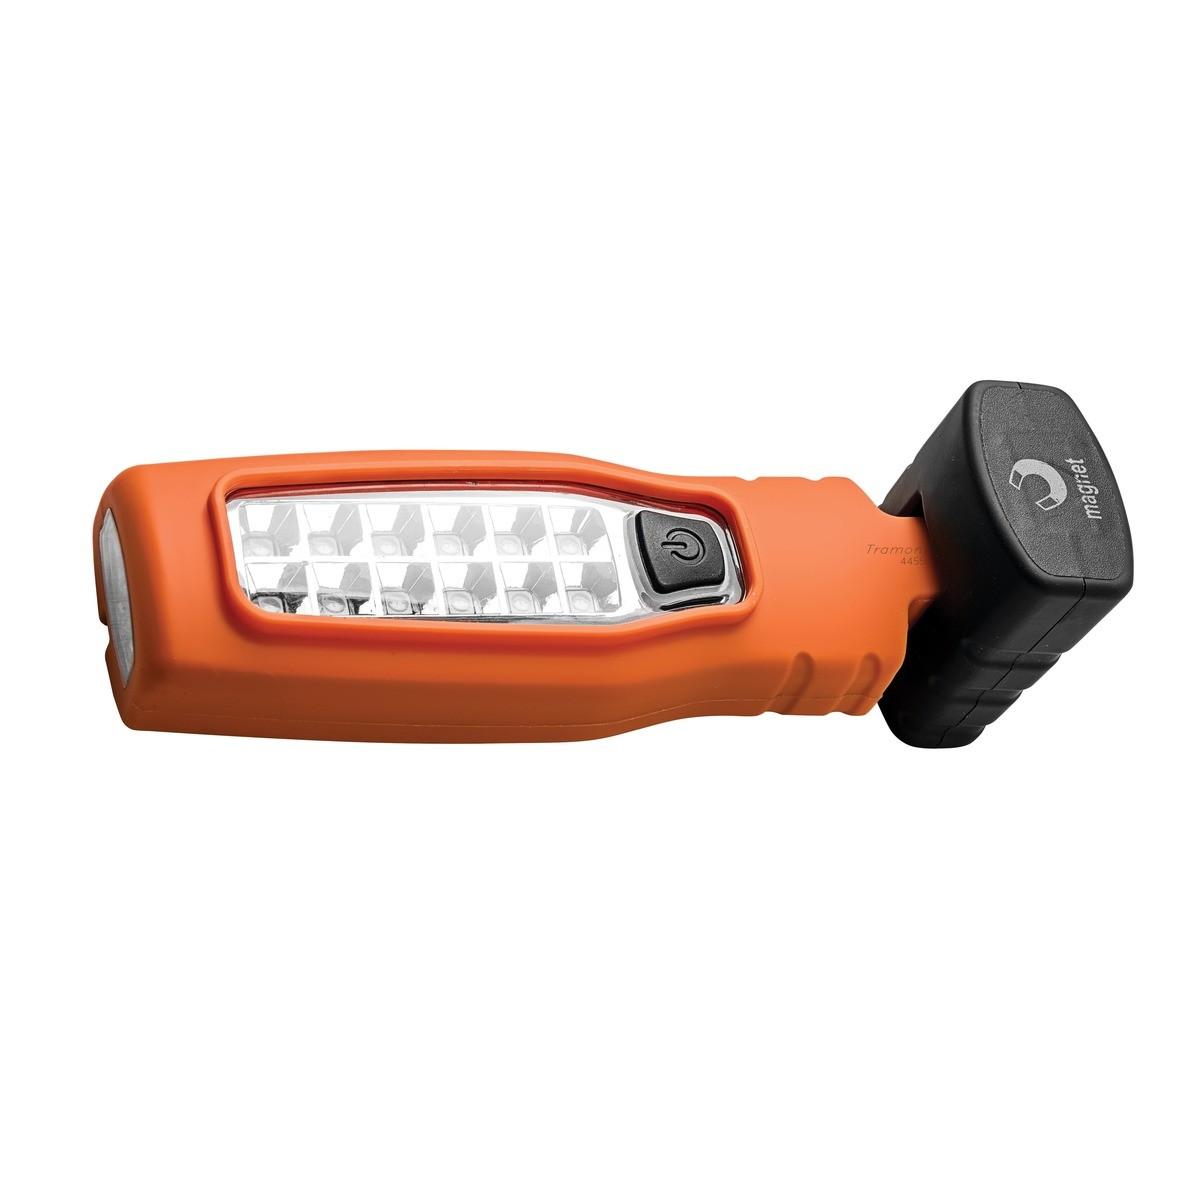 Lanterna de LED Recarregável Base Magnética Tramontina PRO